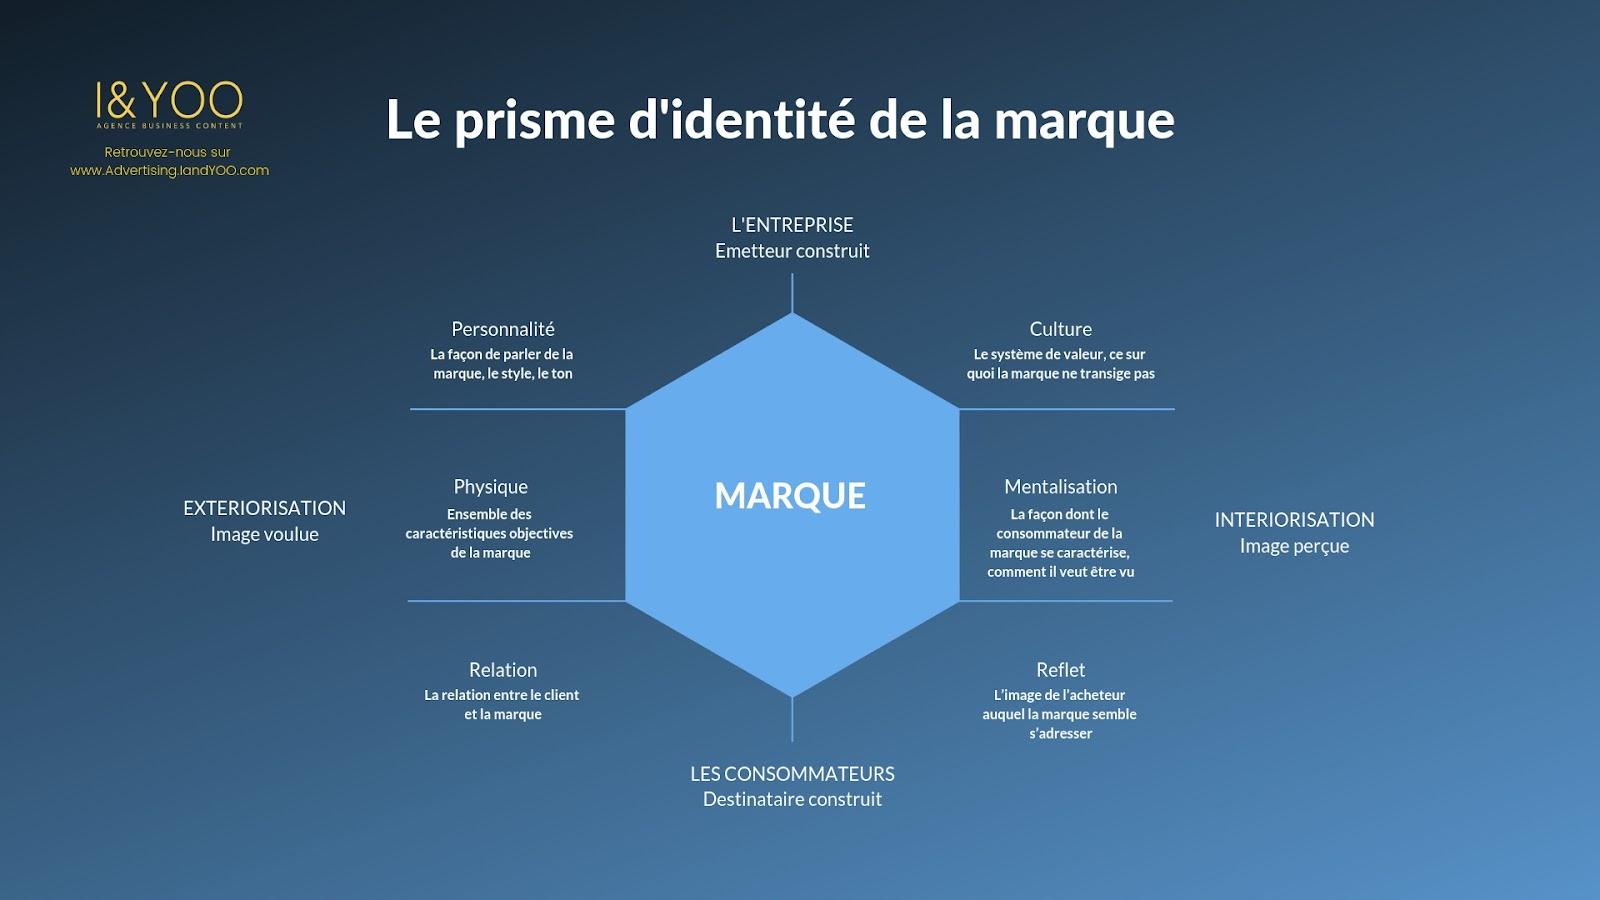 Plateforme de marque - prisme d'identité Jean Noel Kapferer Gilles Laurent